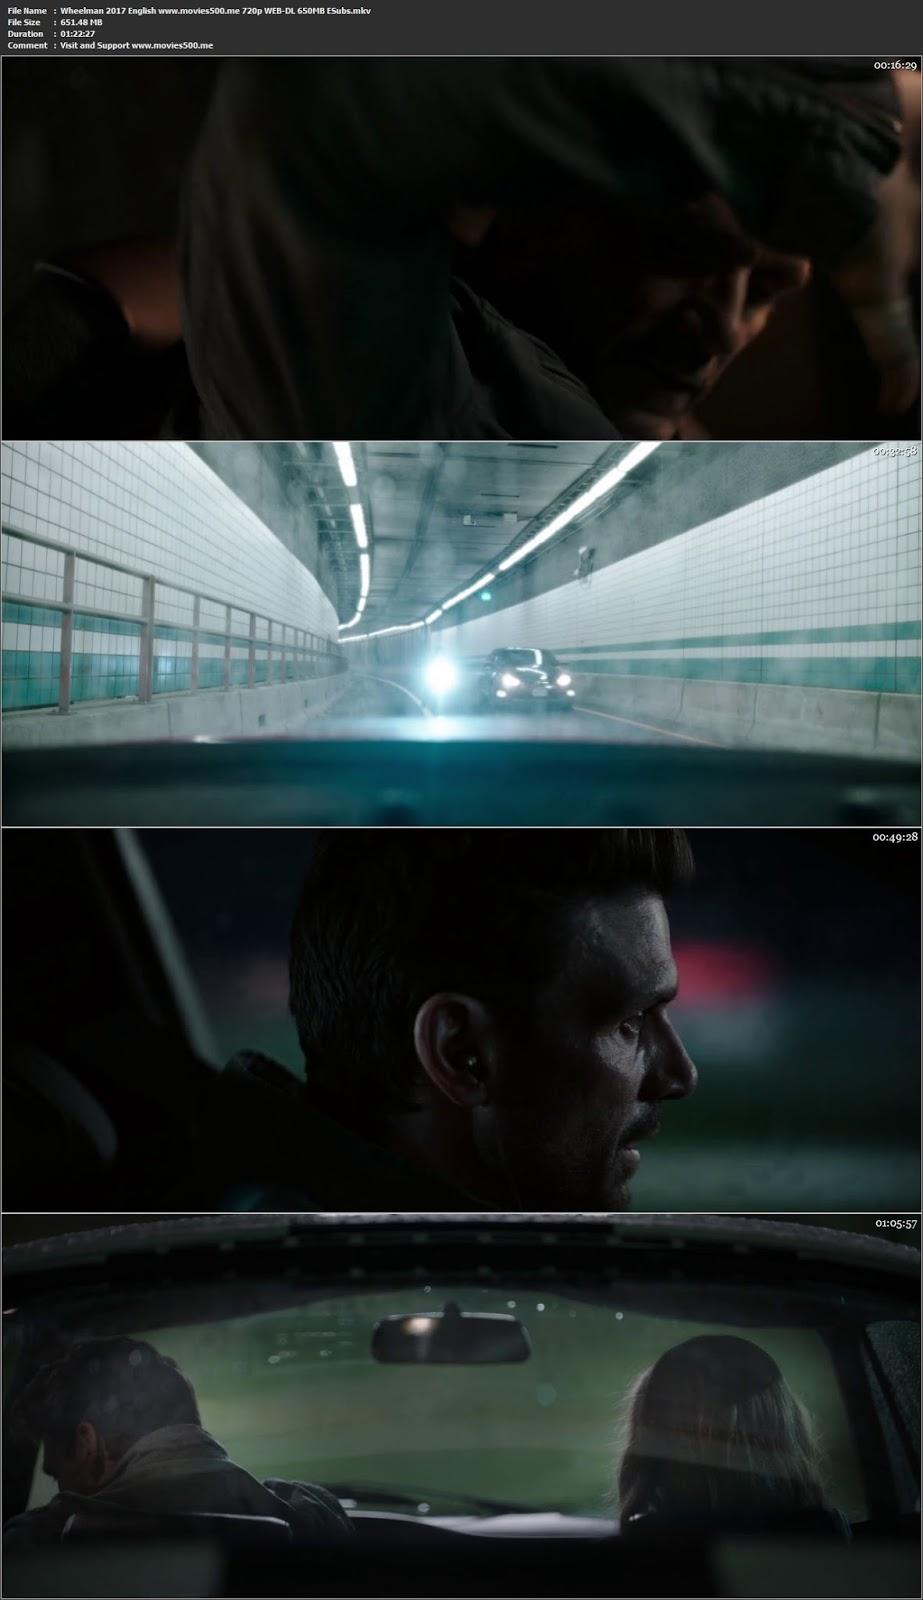 Wheelman 2017 English WEB DL 720p ESubs at movies500.site